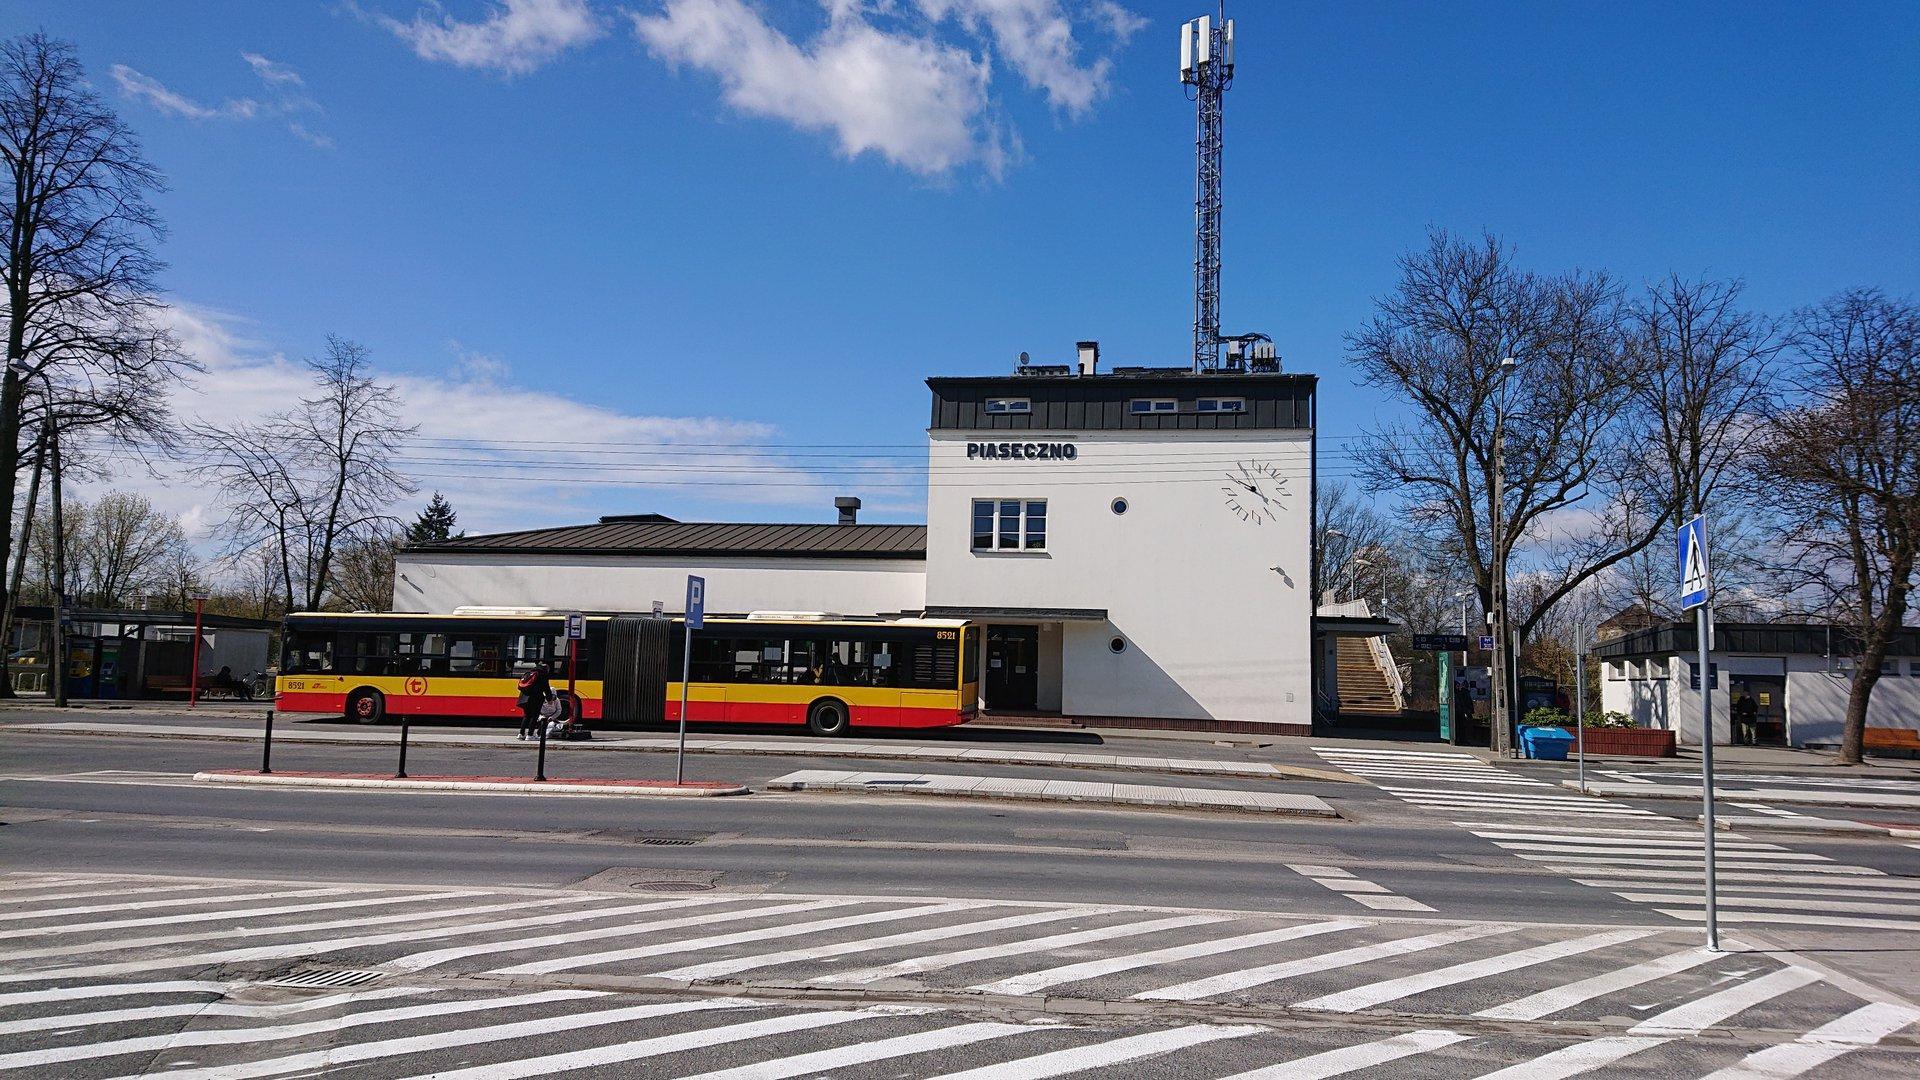 Piaseczno (Piaseczno)